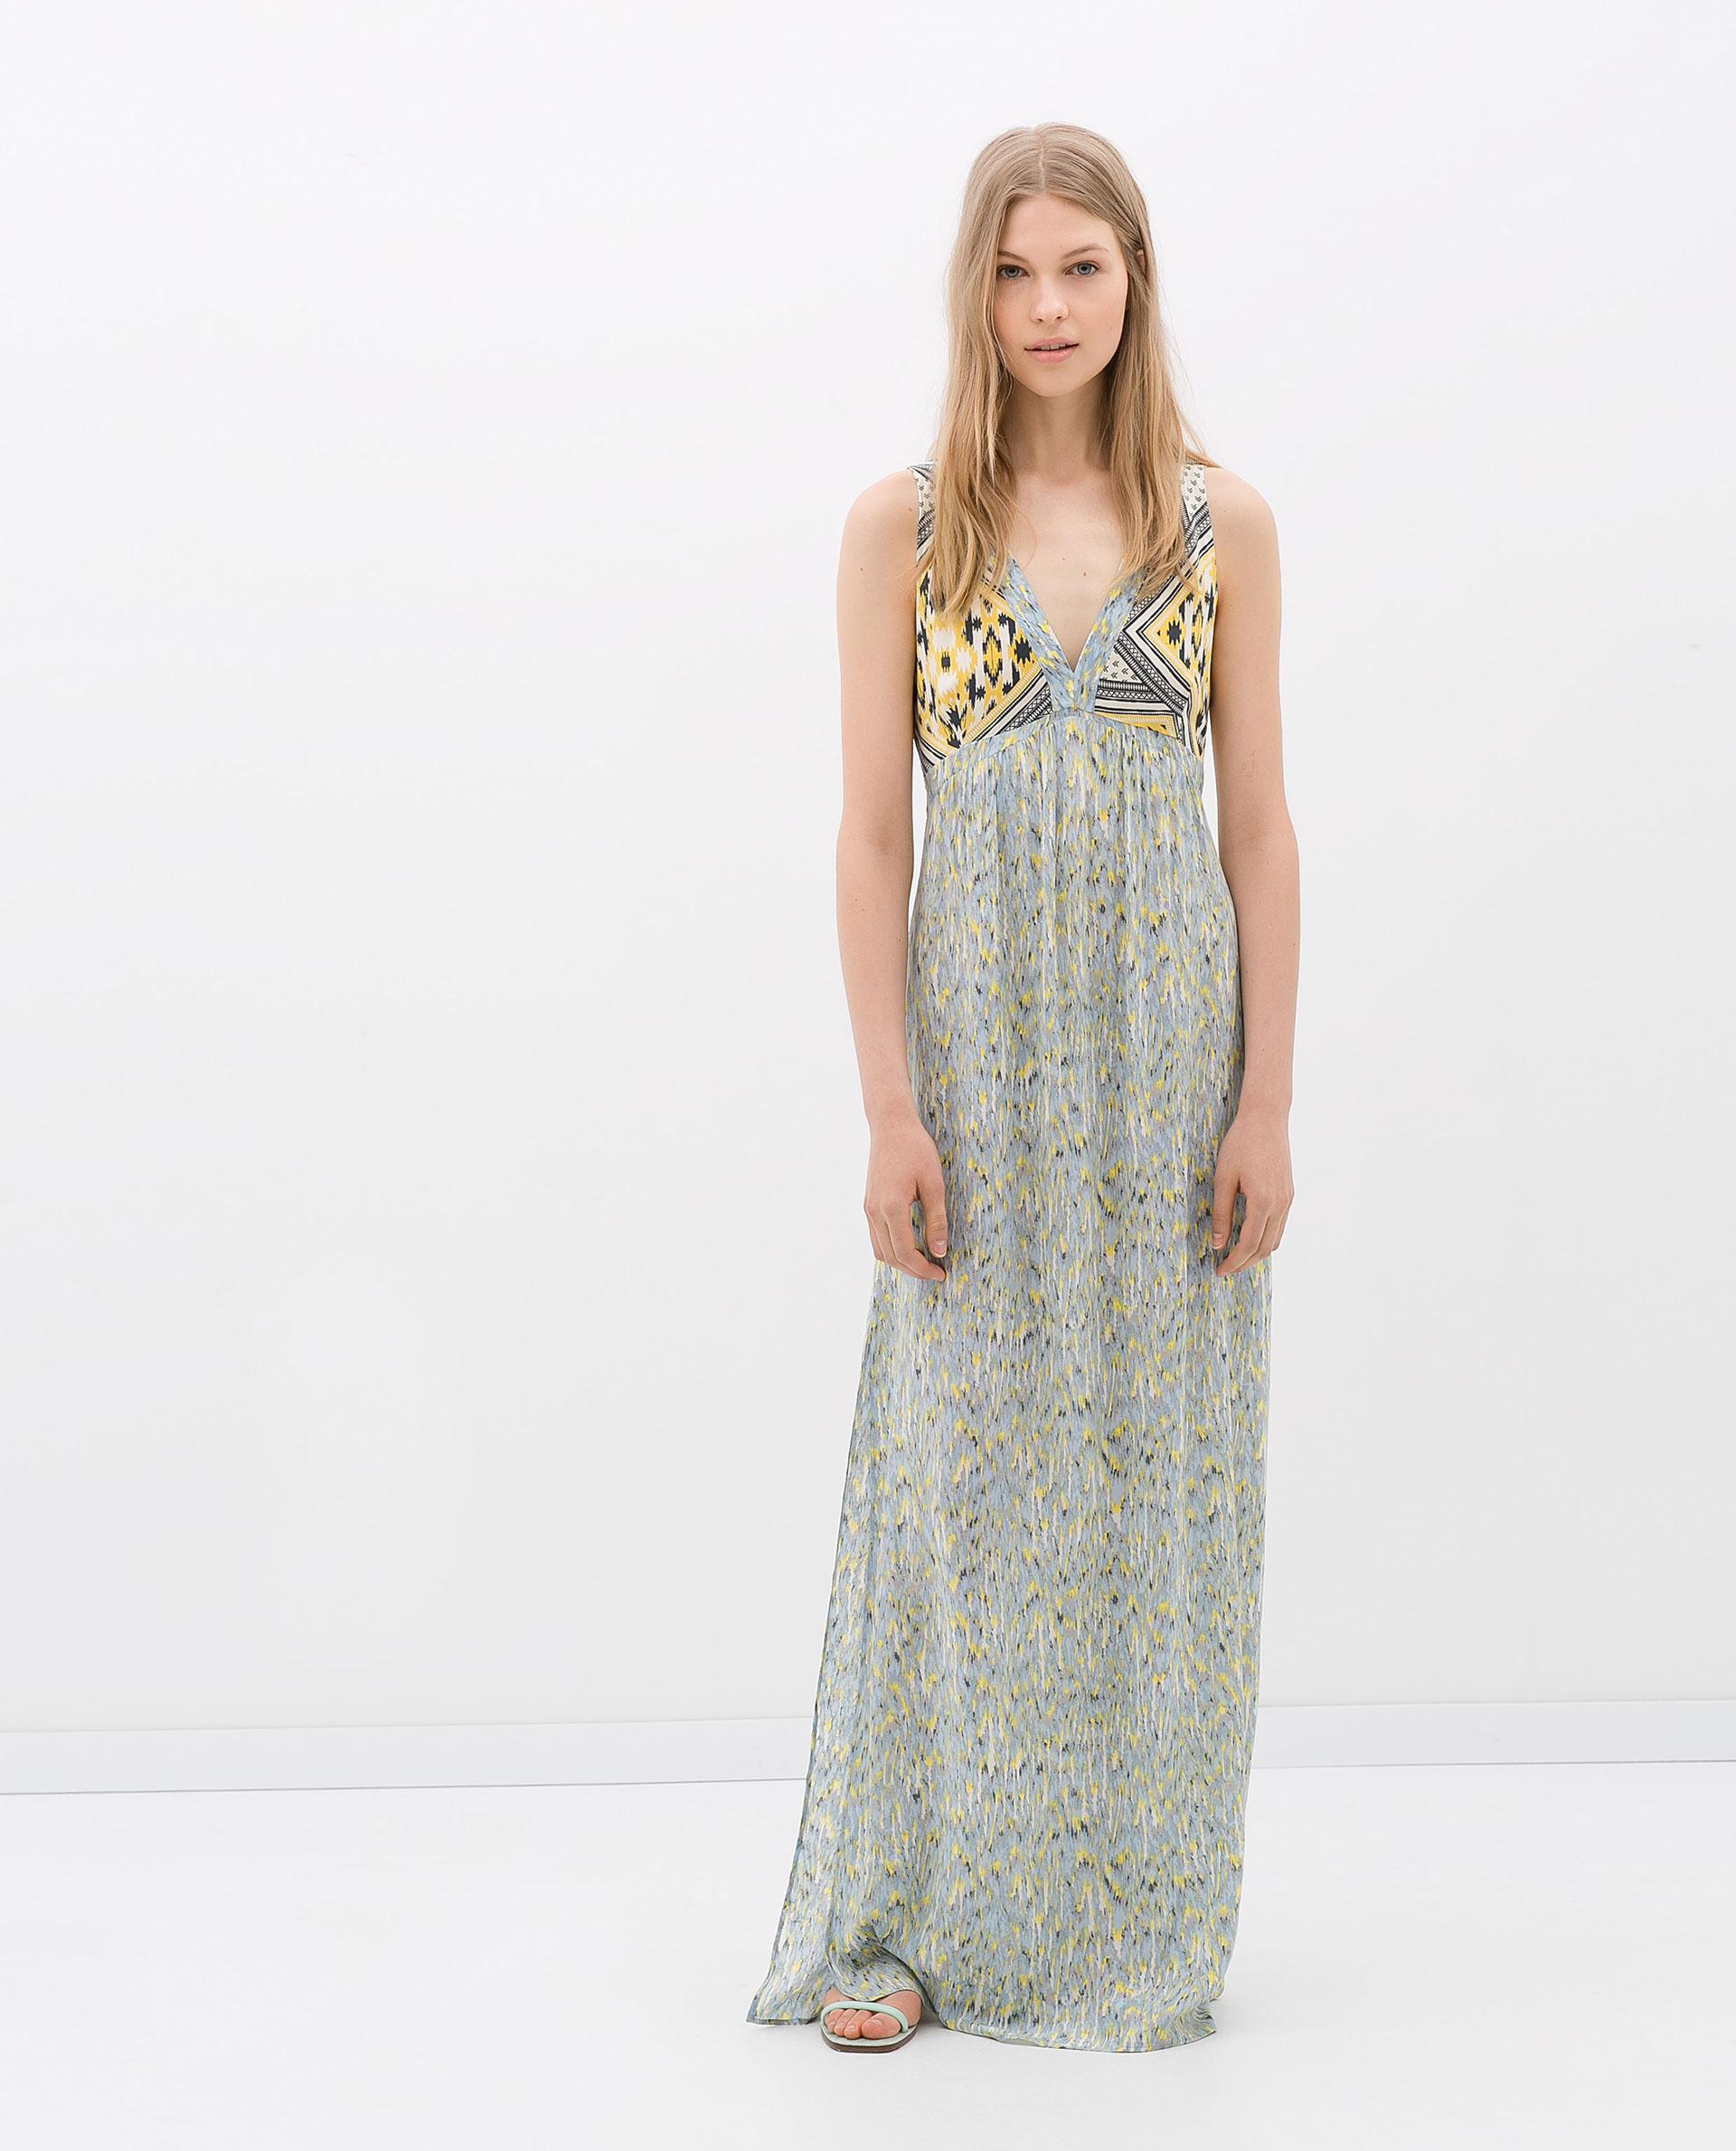 Zara Combined Maxi Dress in Yellow | Lyst